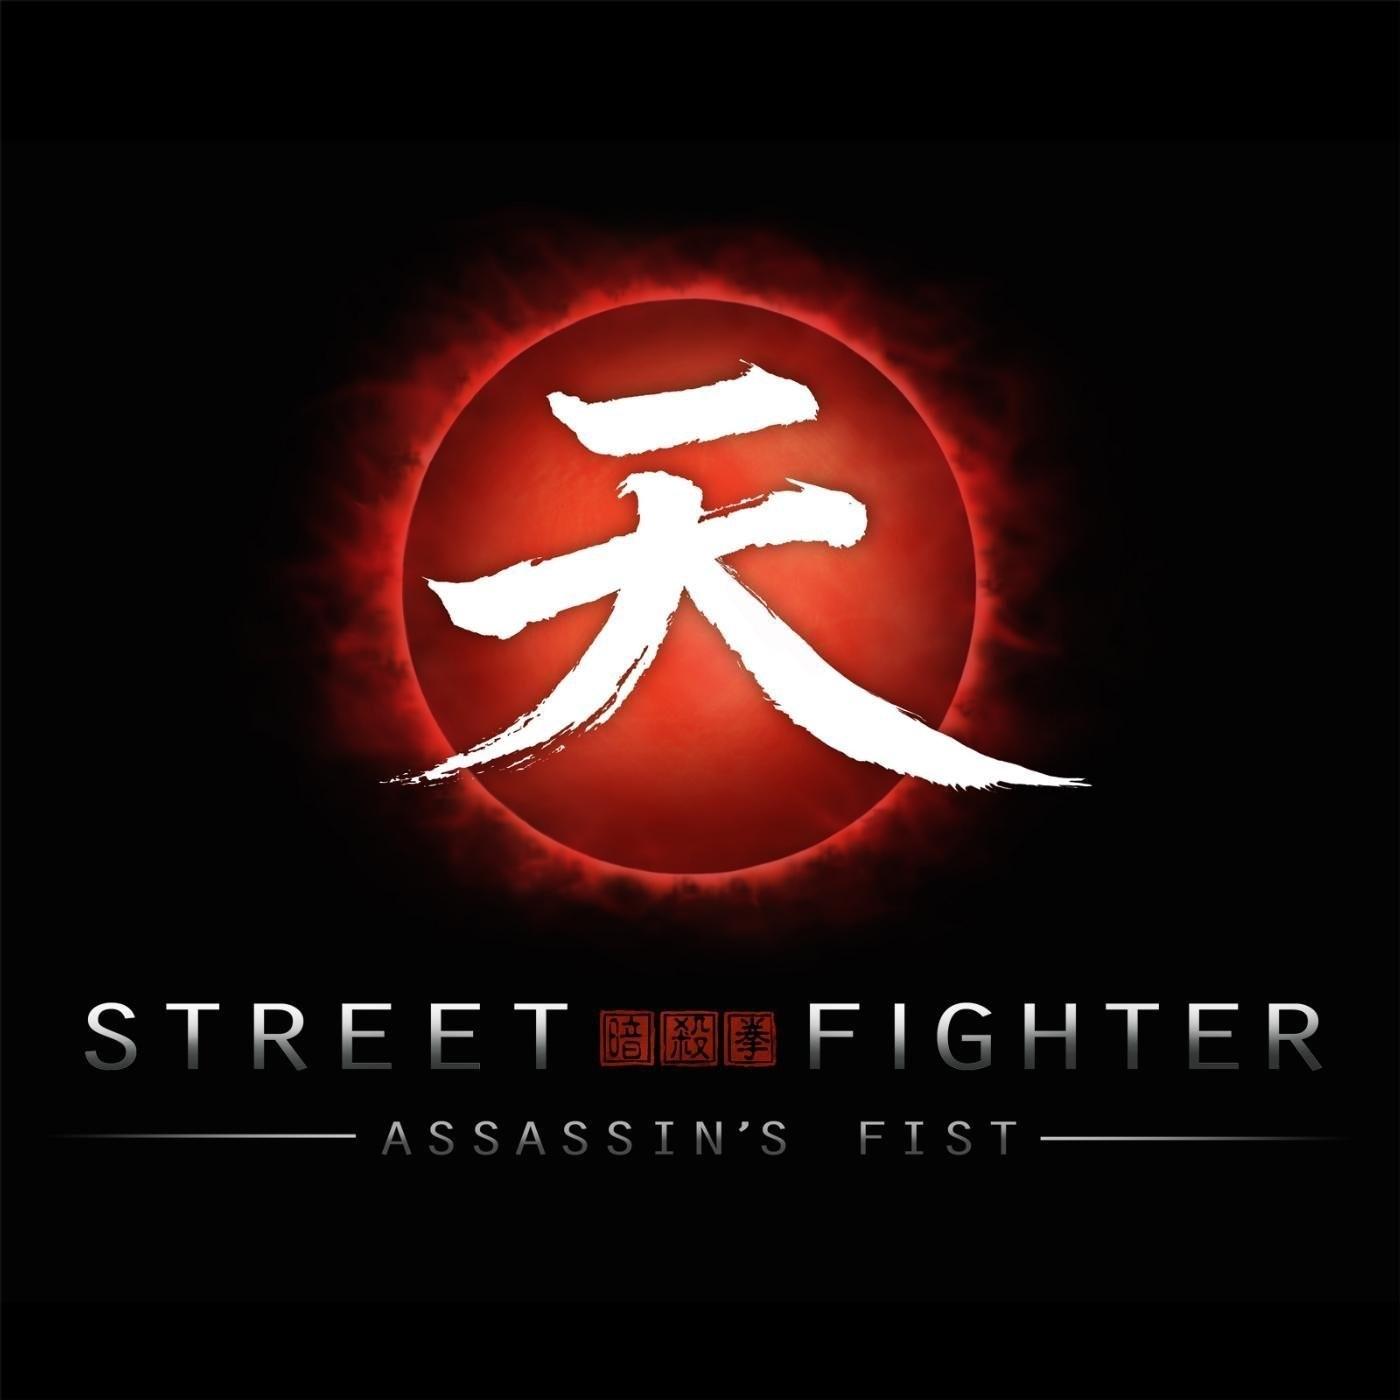 Film Music Site Street Fighter Assassin S Fist Soundtrack Patrick Gill 2014